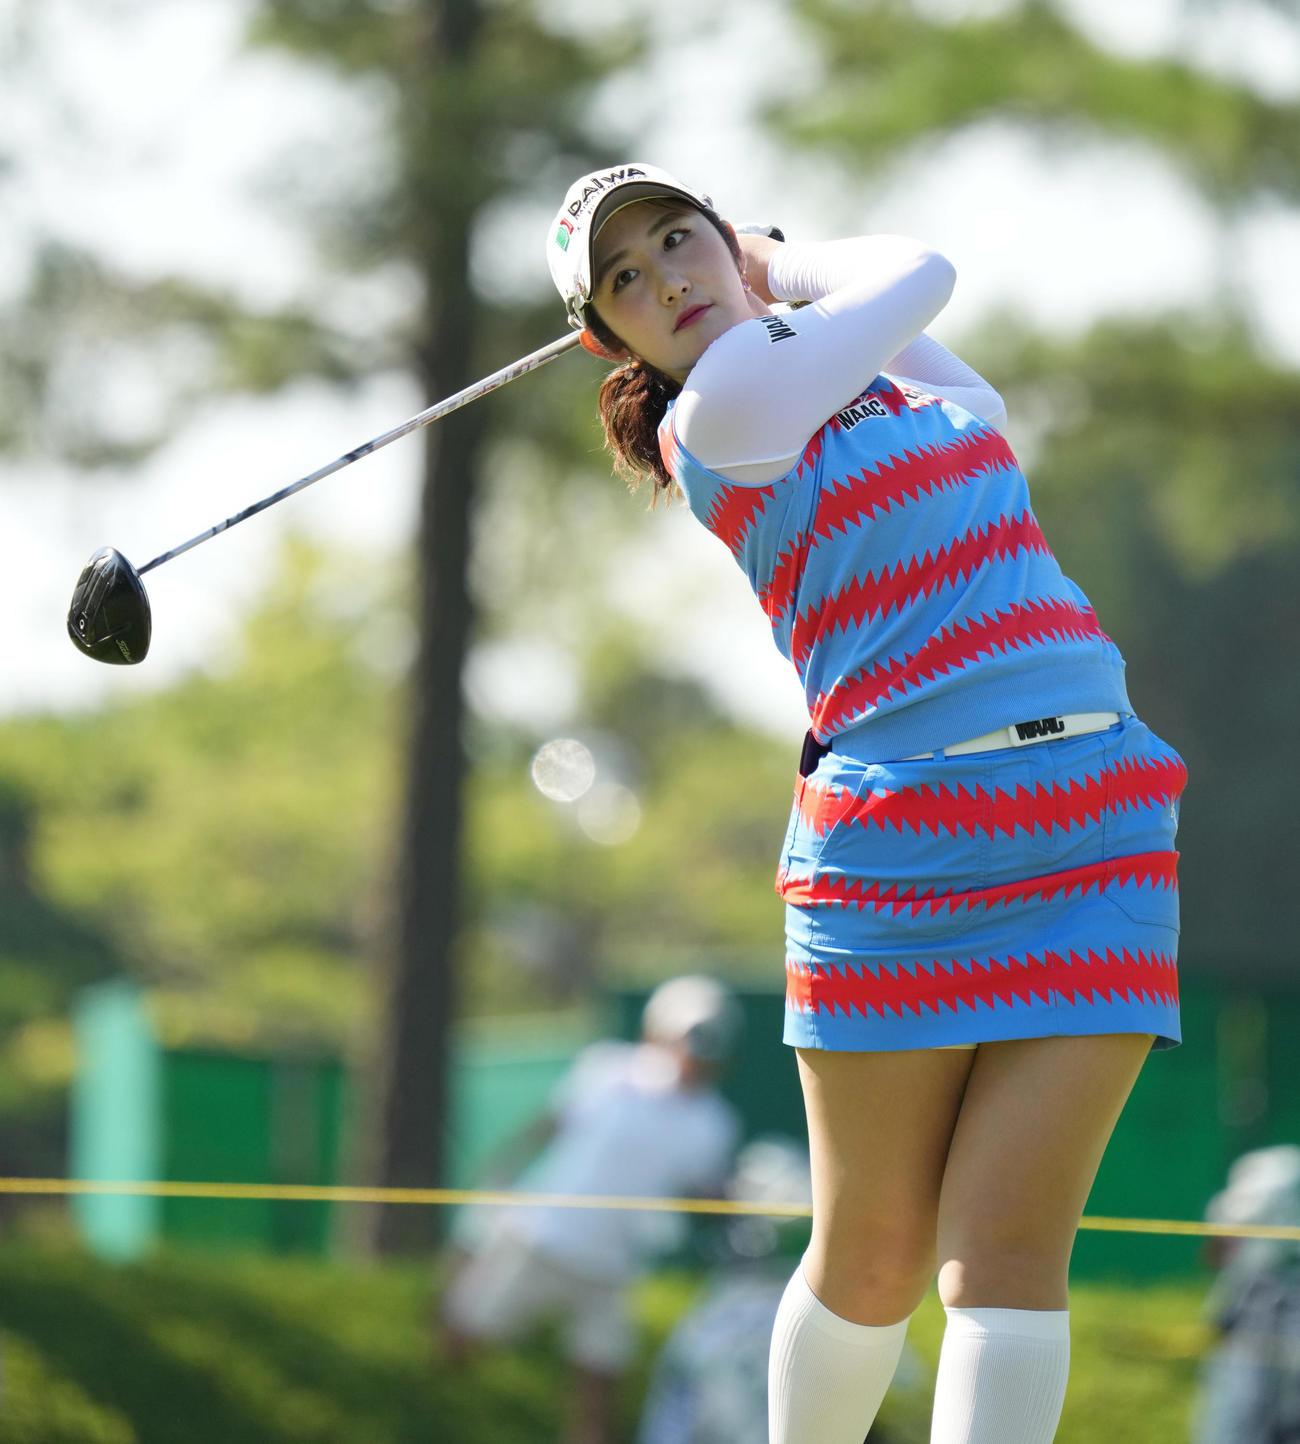 https://www.nikkansports.com/sports/golf/news/img/202106100000032-w1300_11.jpg